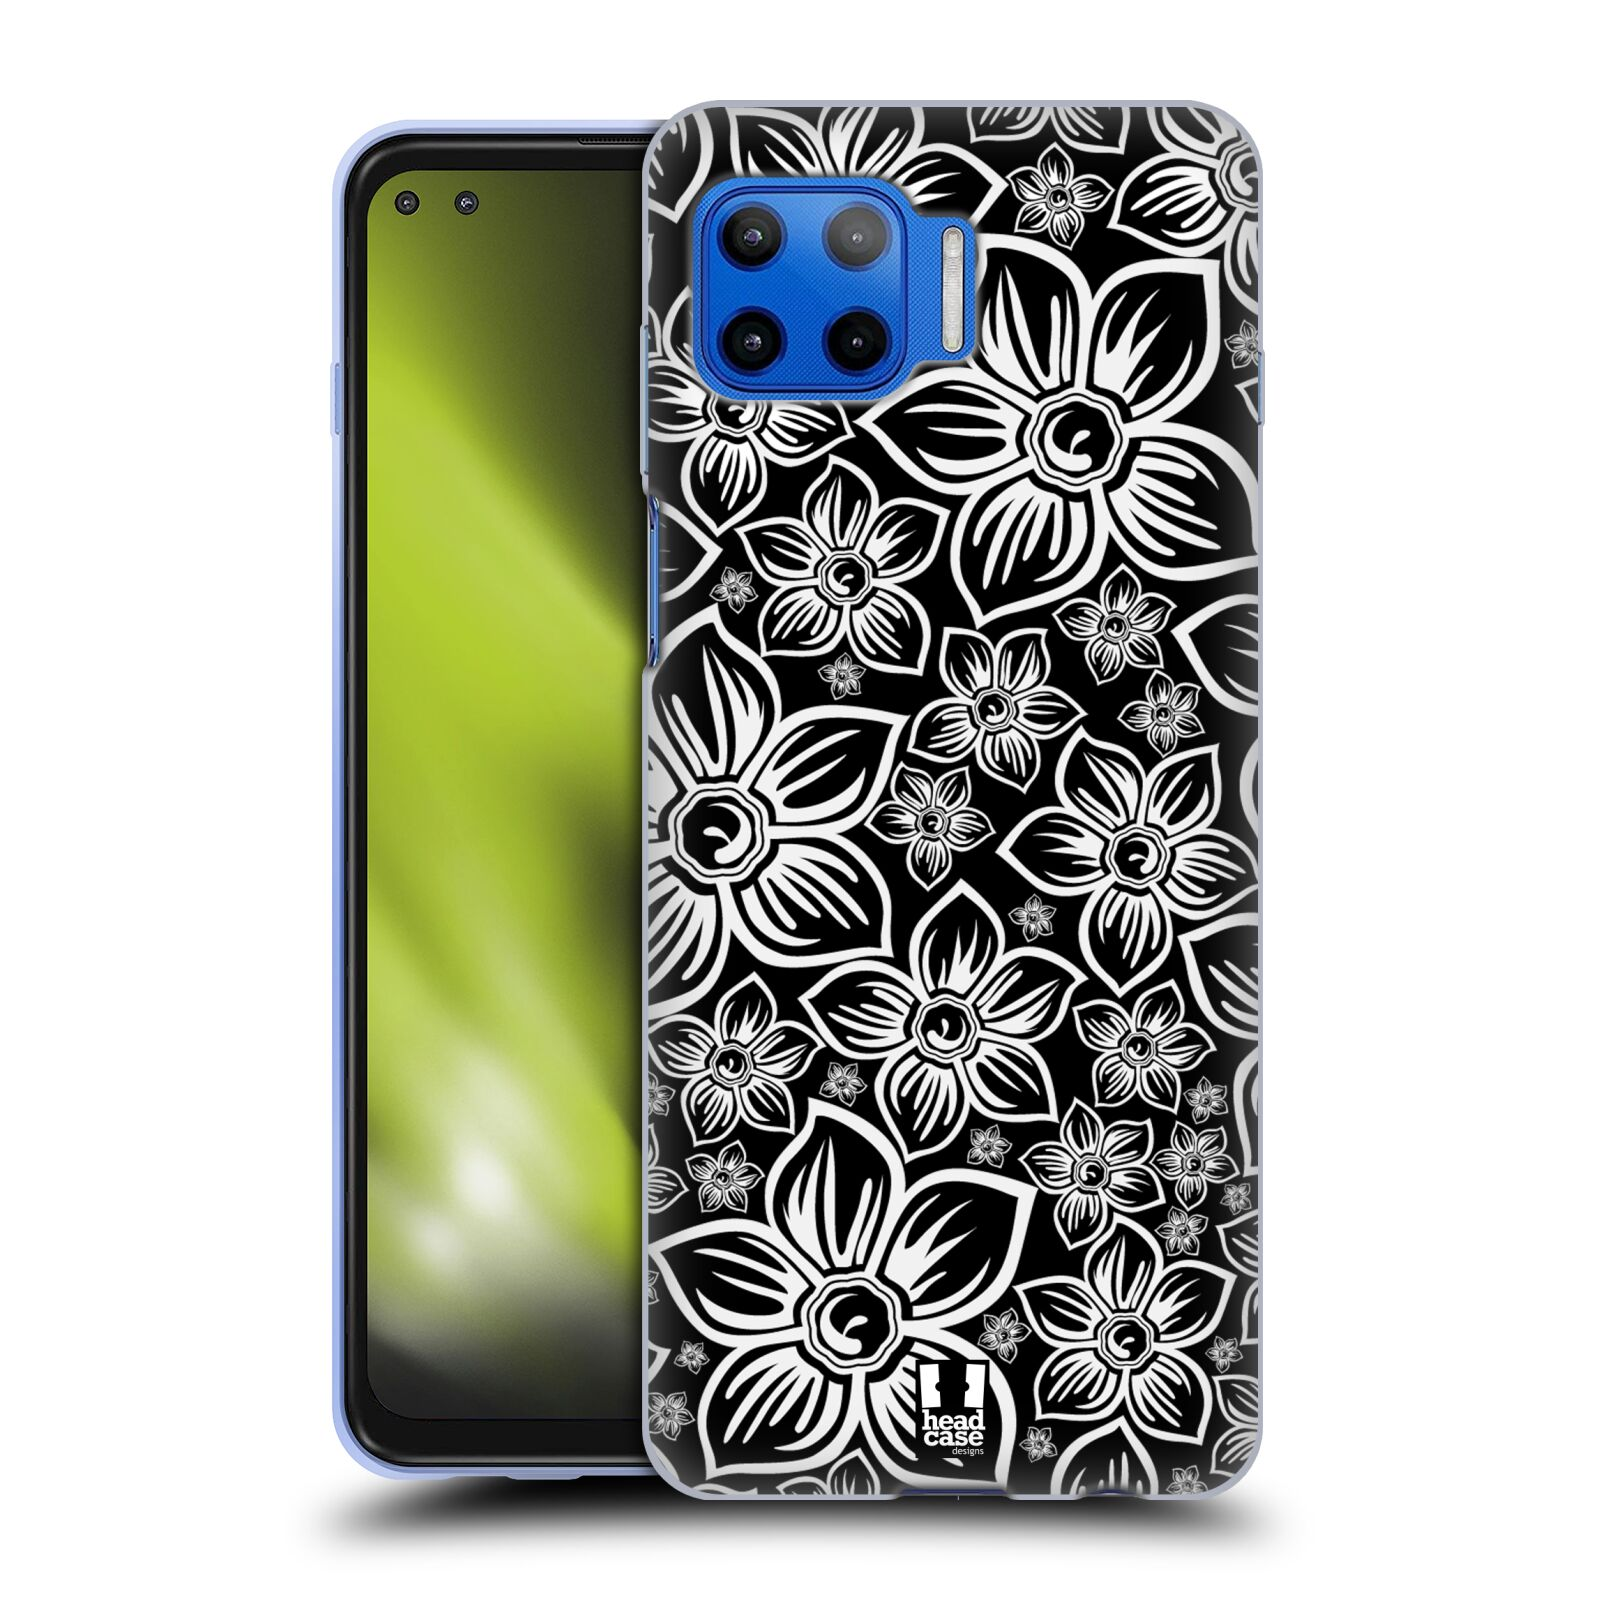 Silikonové pouzdro na mobil Motorola Moto G 5G Plus - Head Case - FLORAL DAISY